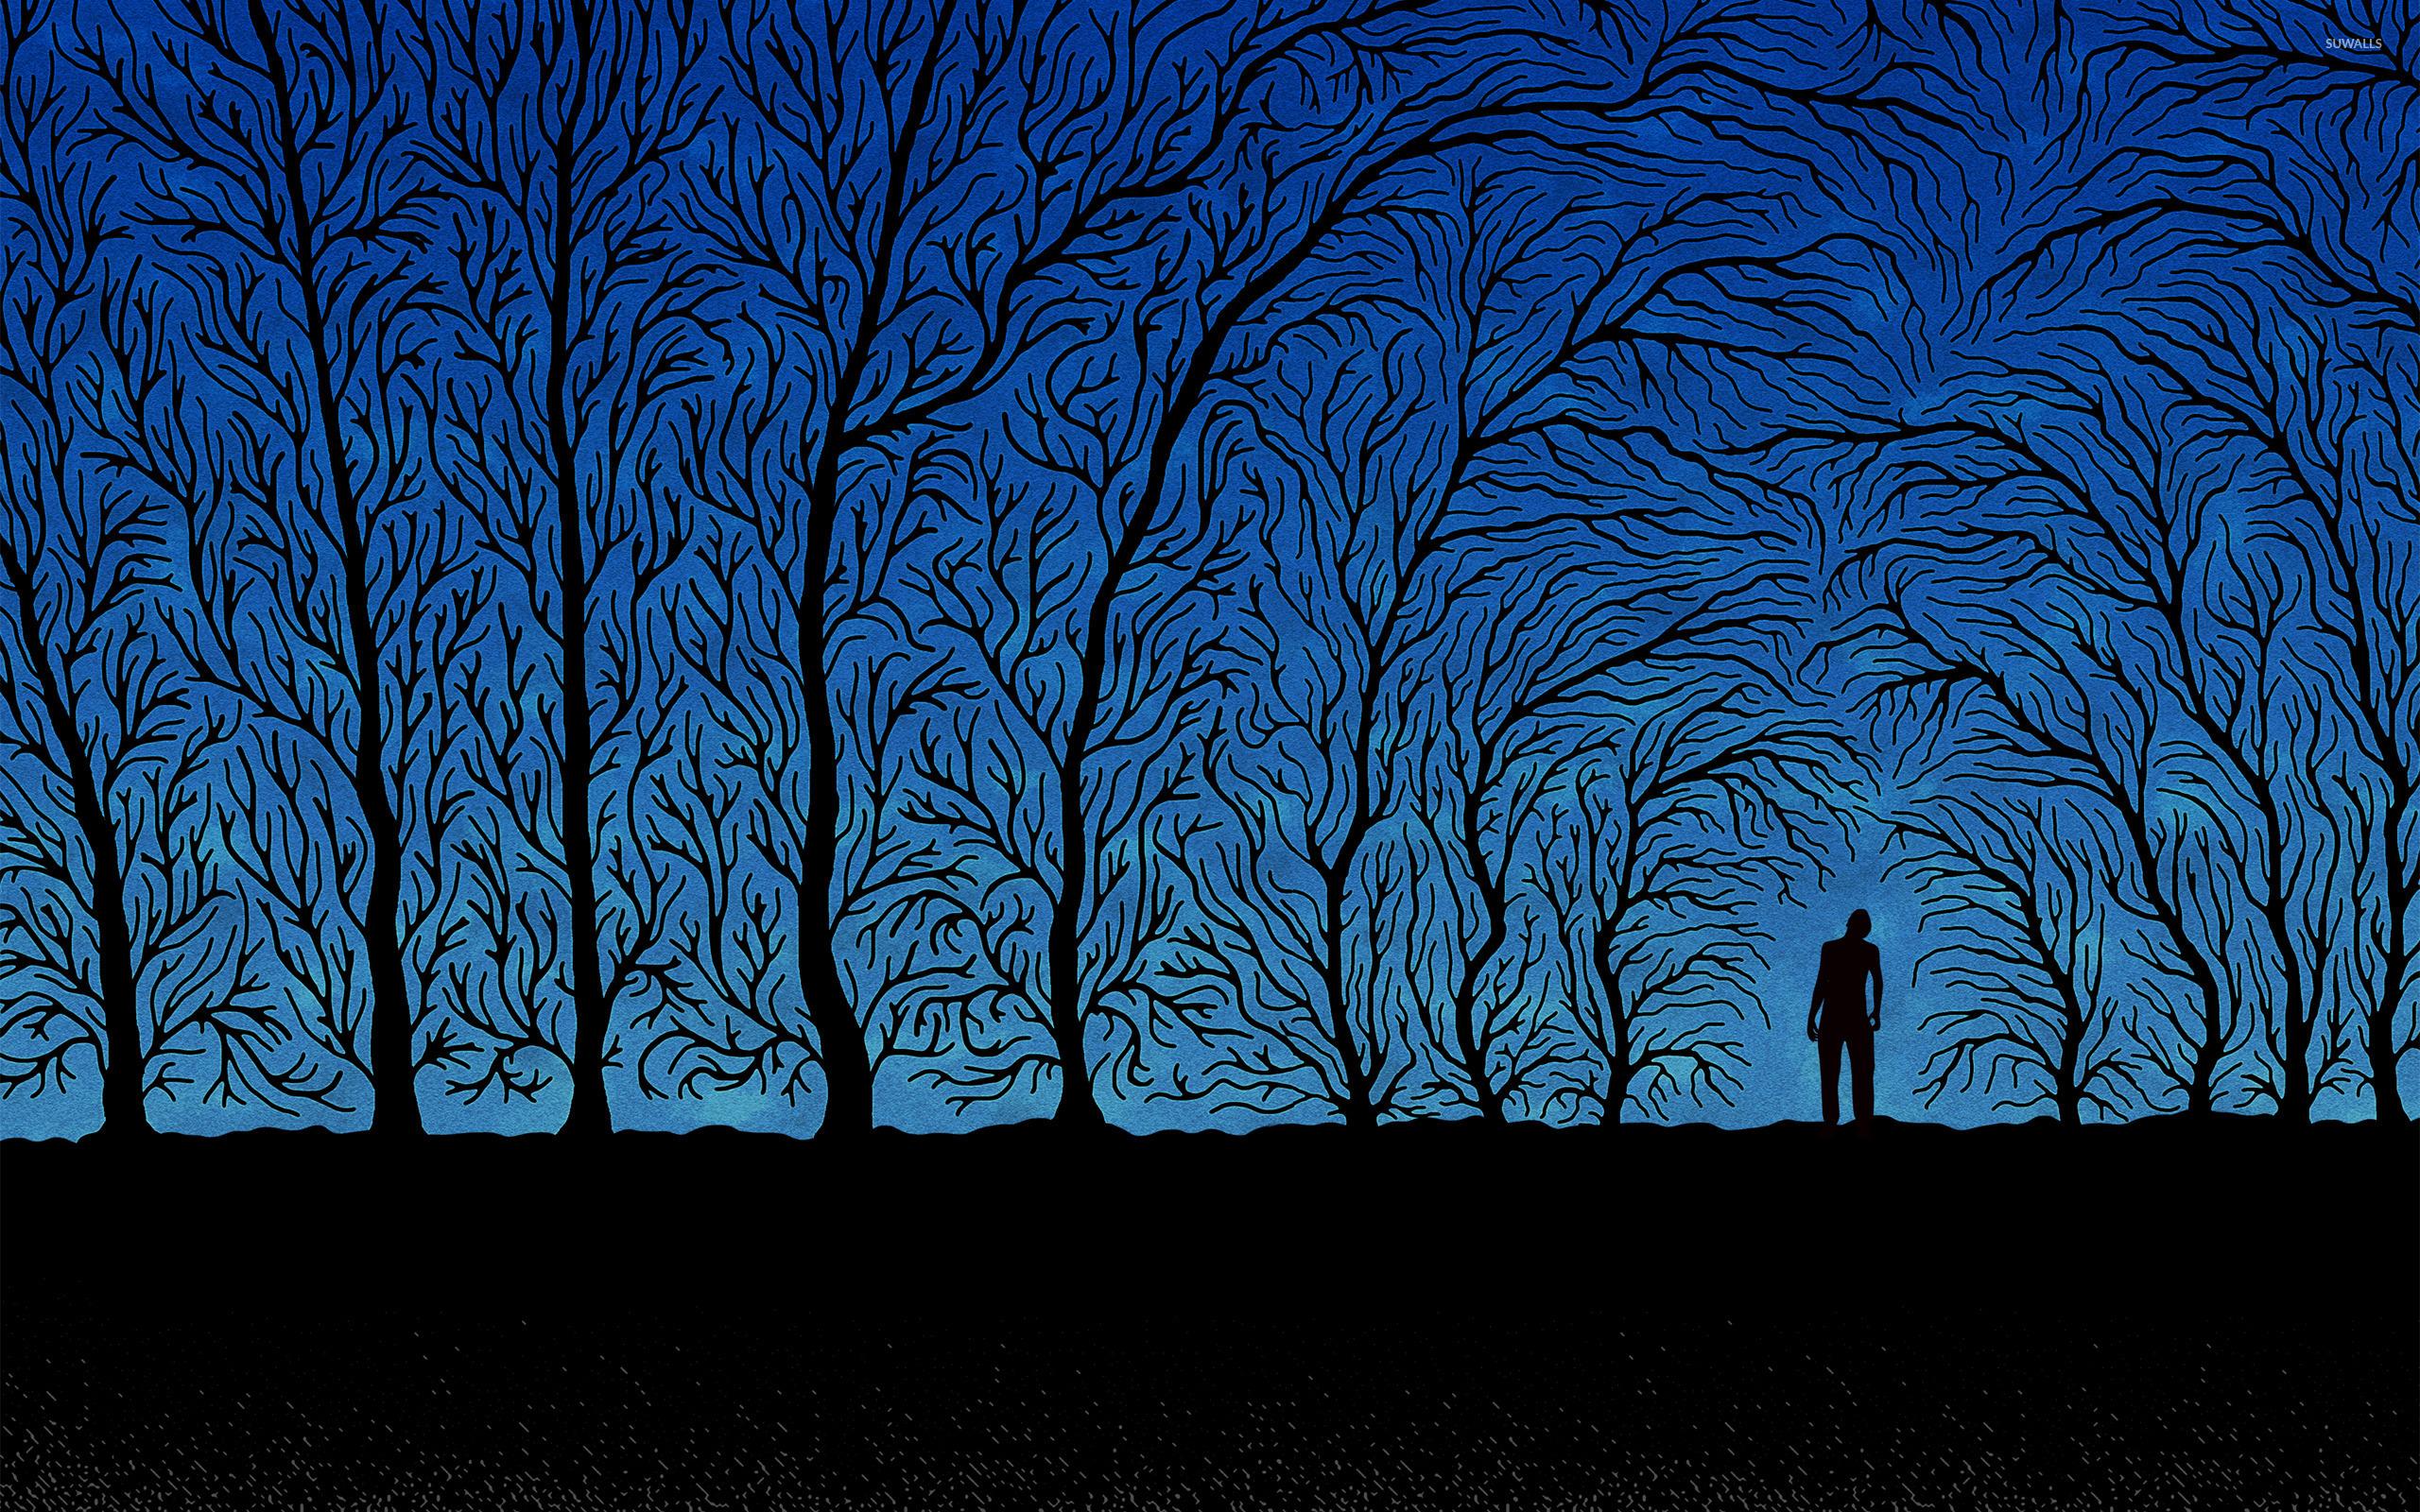 Spooky Forest Wallpaper